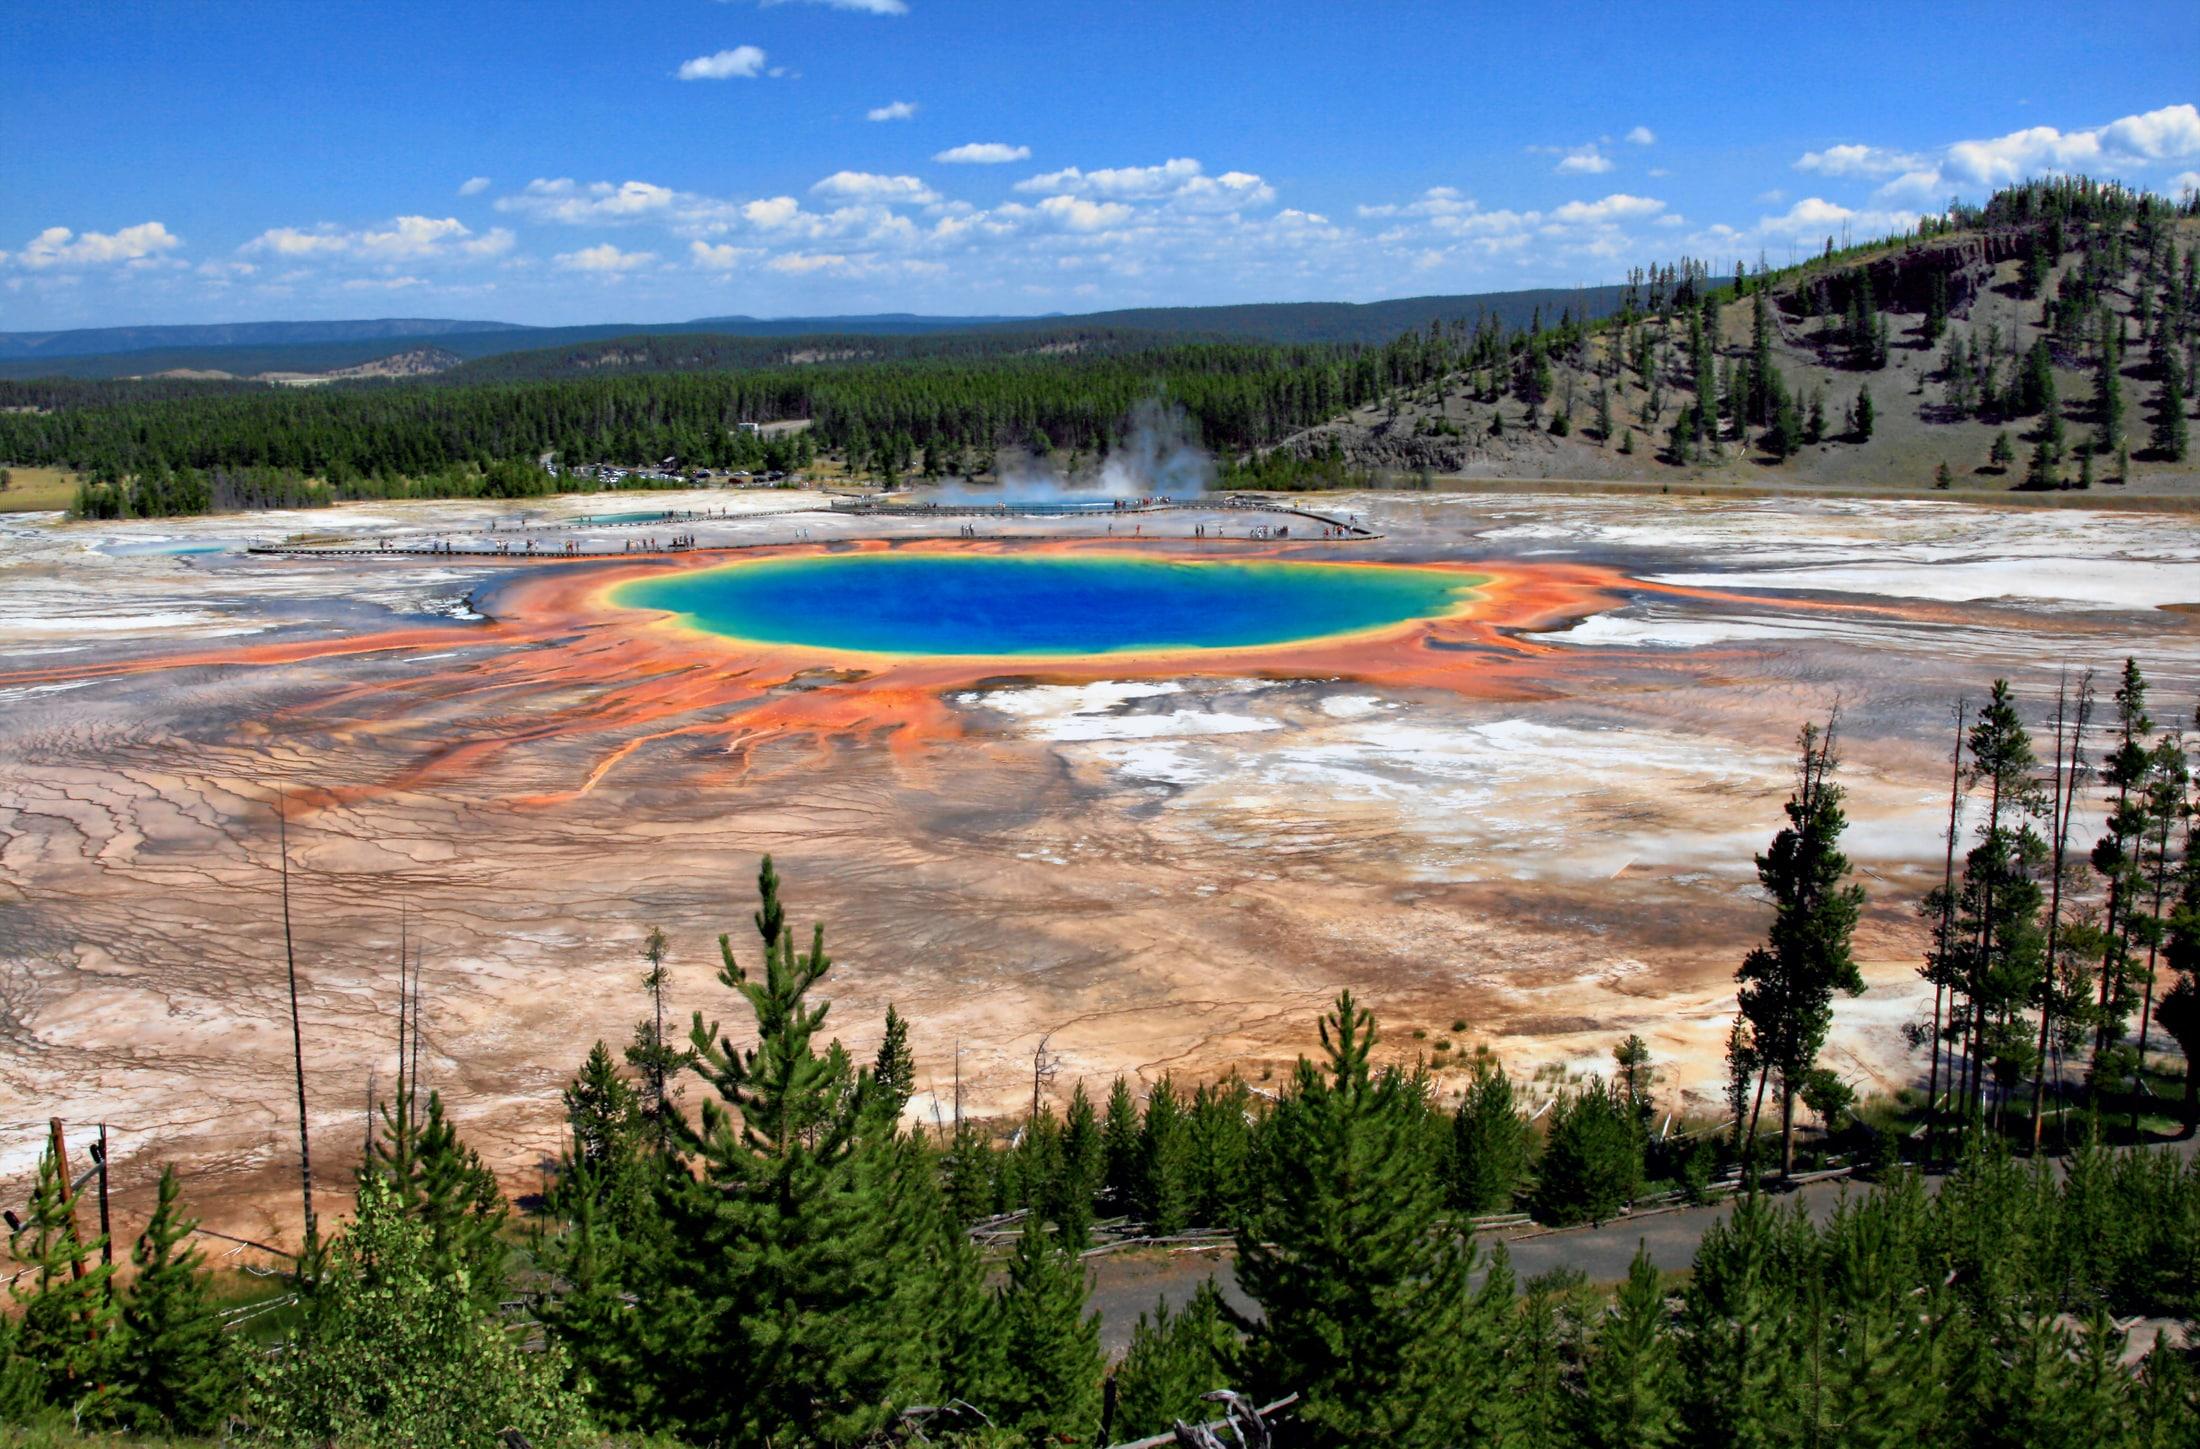 grand-prismatic-hot-spring-the-largest-o-secret-world